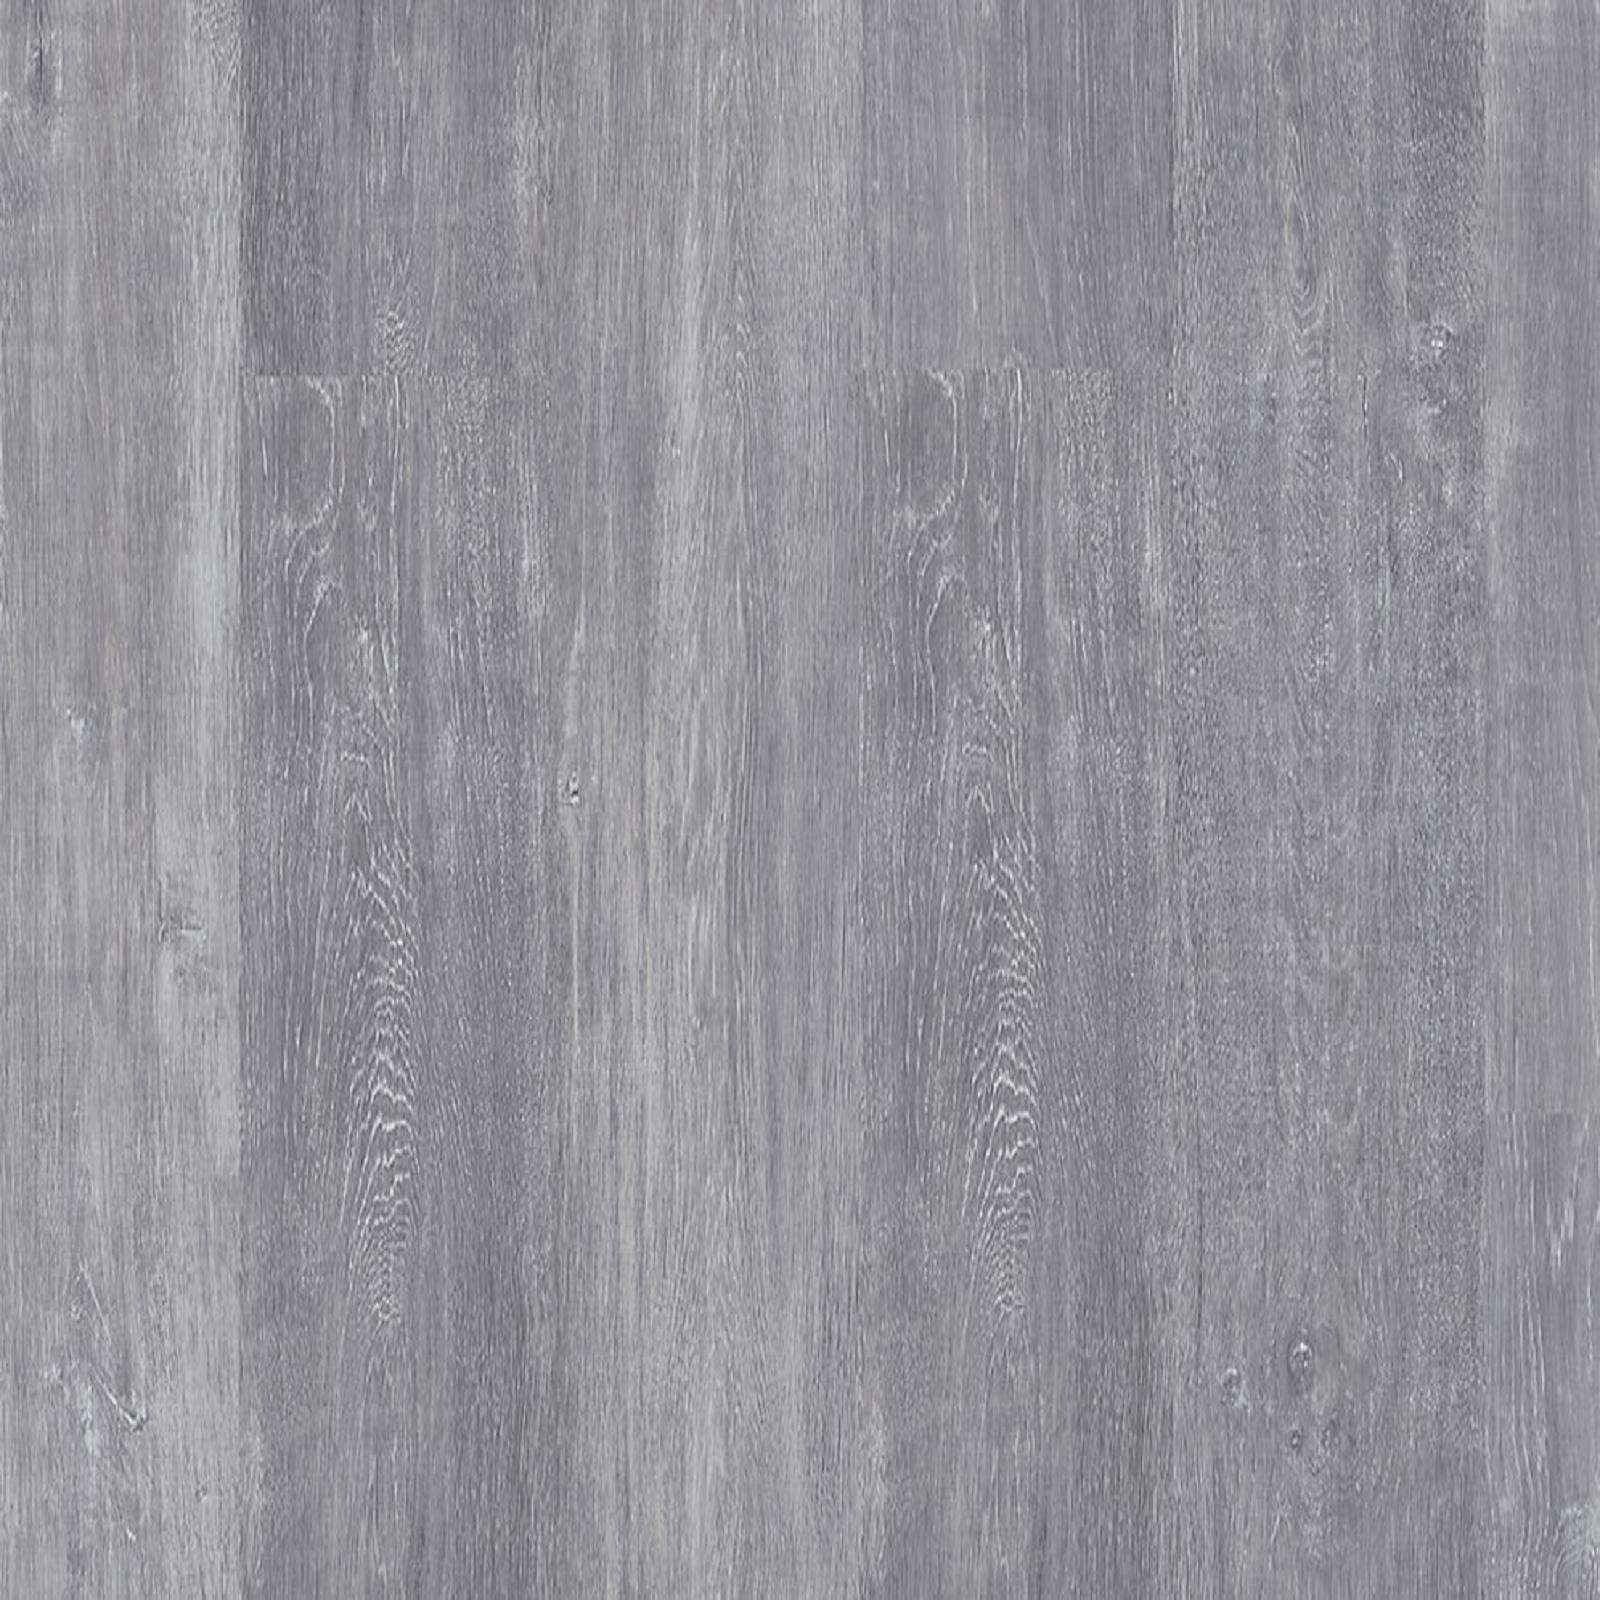 Senso Rustic 914 x 184 x 2mm 2.69m² Hudson Perle Vinyl Planks - 16 Pack